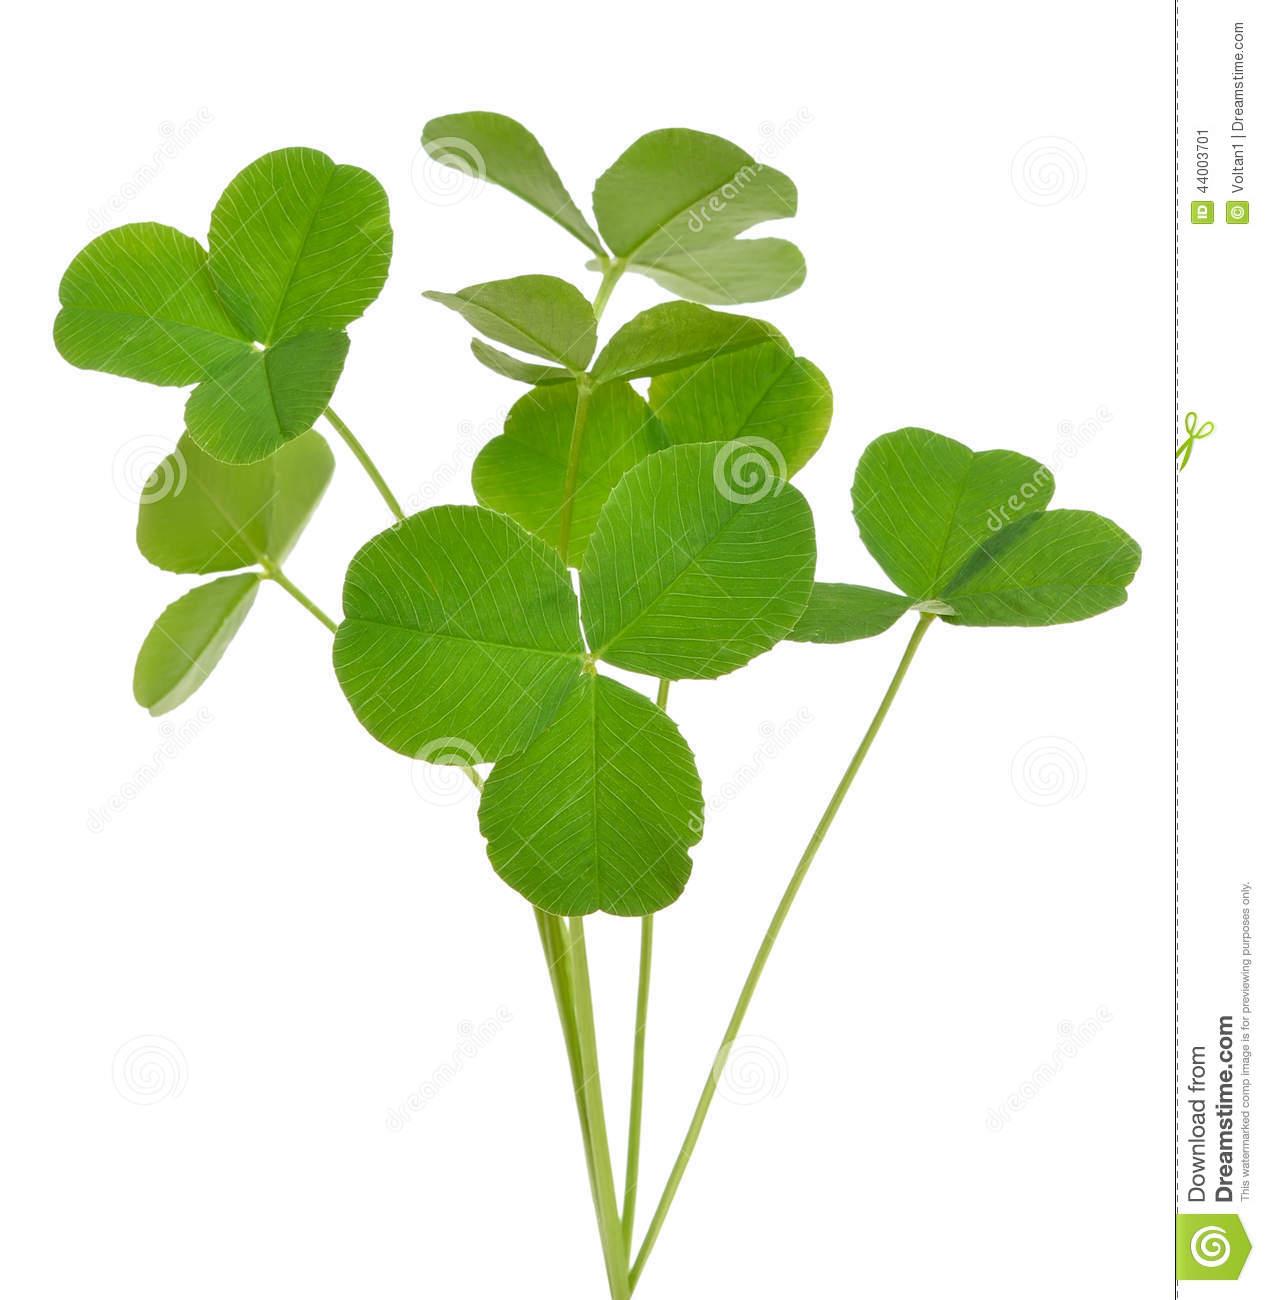 Oxalis Acetosella (wood Sorrel) Plant Stock Photo.